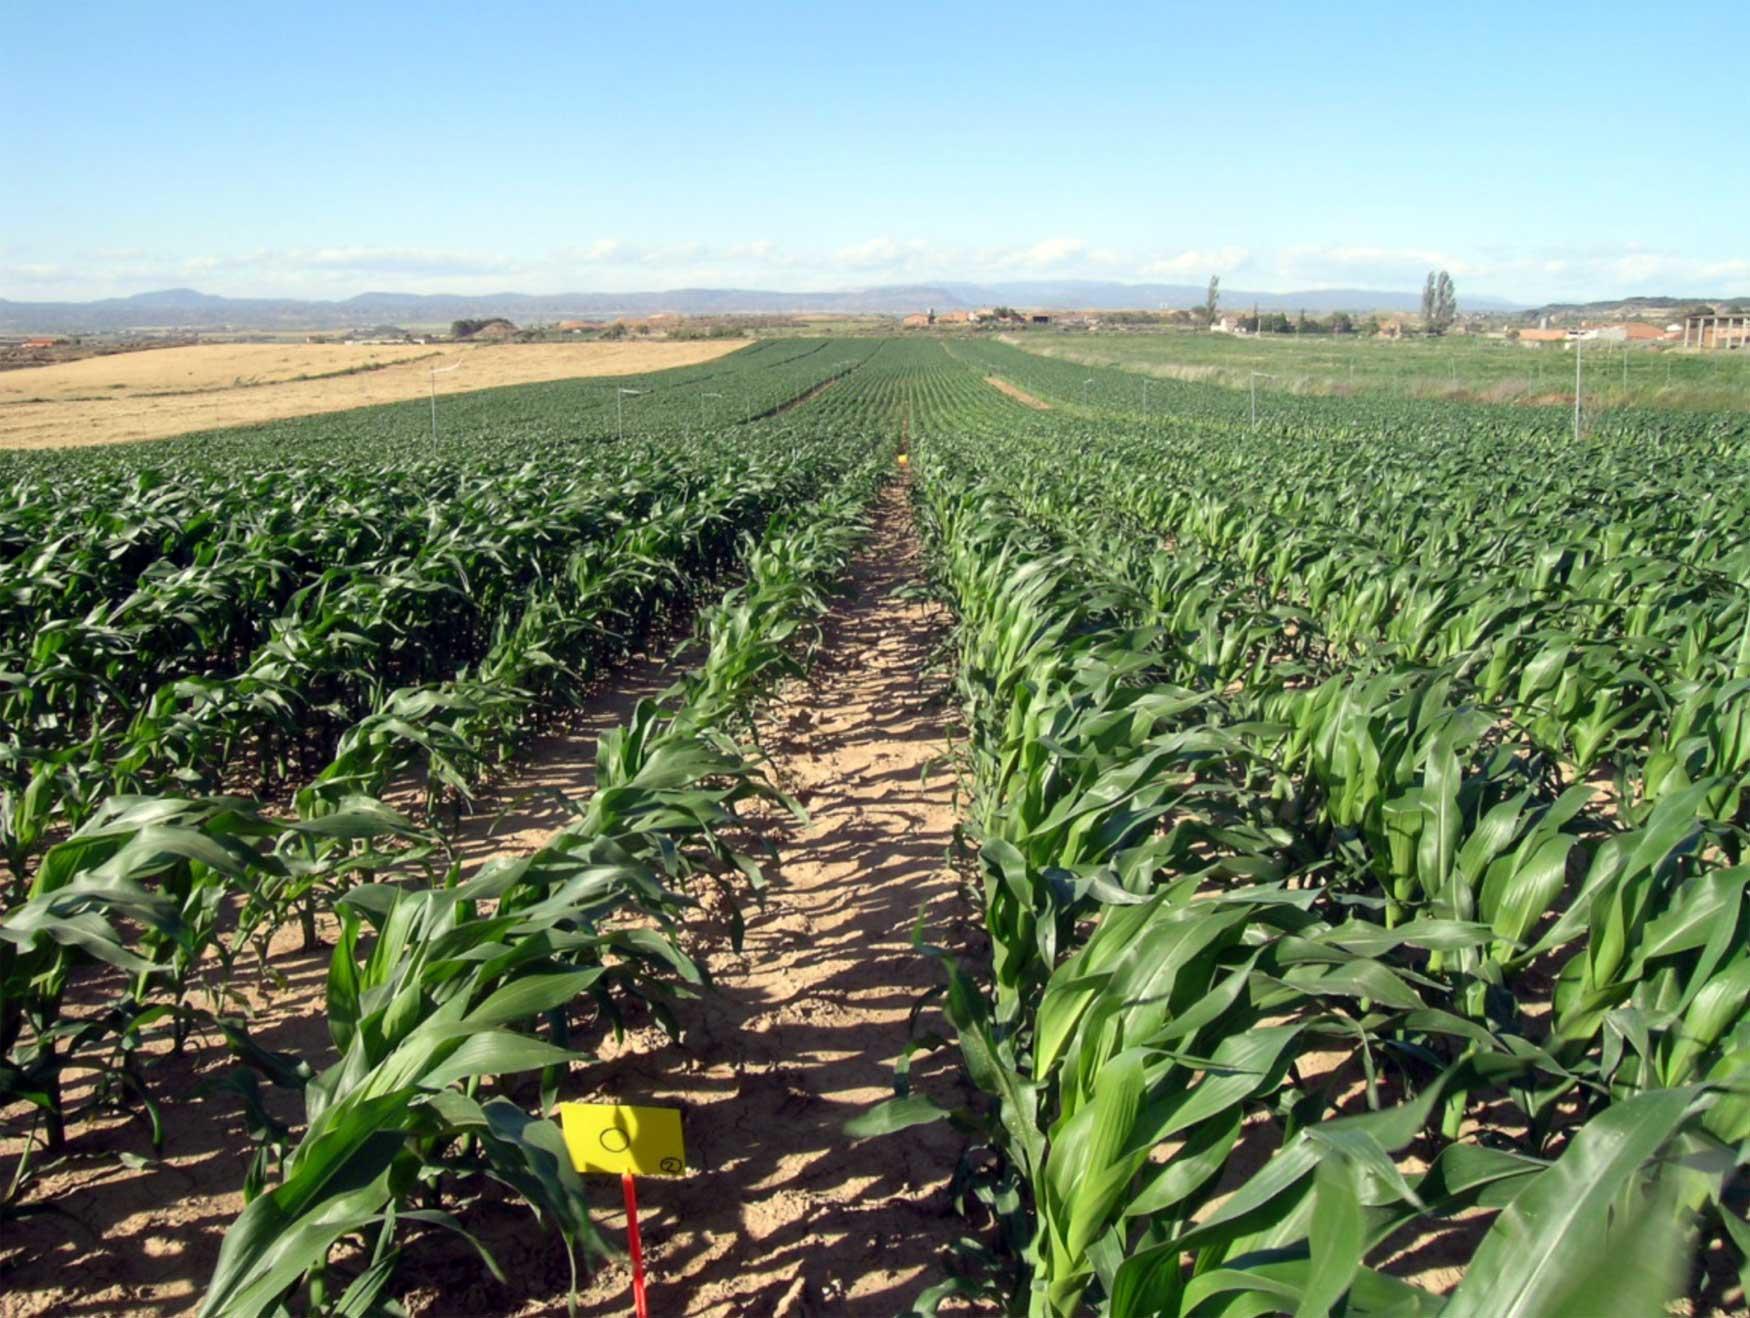 Optimizaci n de la fertilizaci n nitrogenada del ma z tras for Que es la asociacion de cultivos